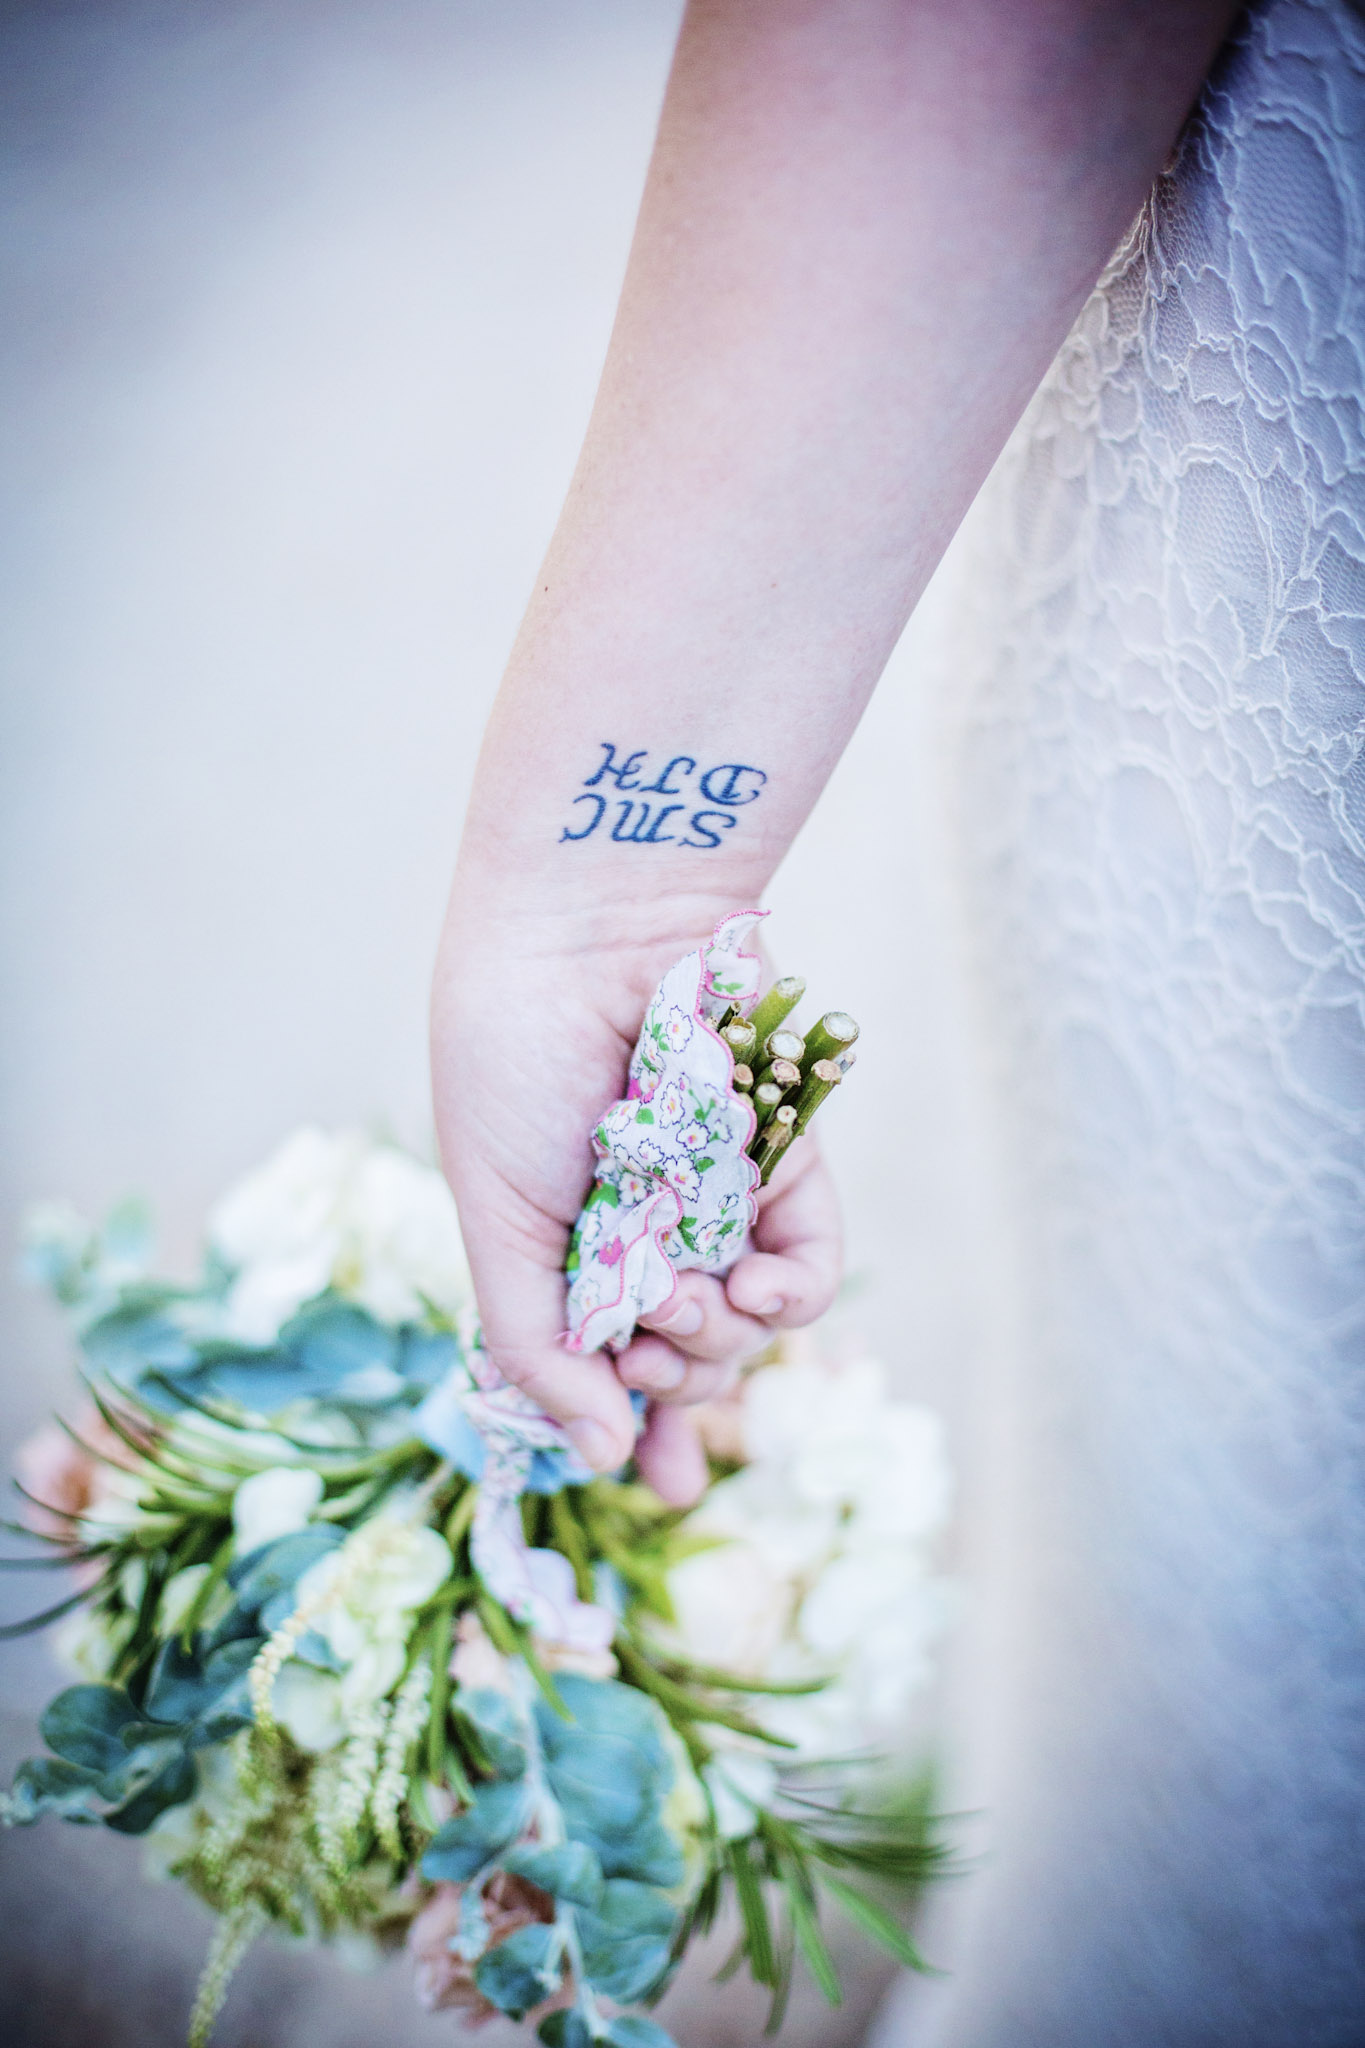 Kansas_City_Small_Wedding_Venue_Elope_Intimate_Ceremony_Budget_Affordable_Miranda&Chad_139b.jpg